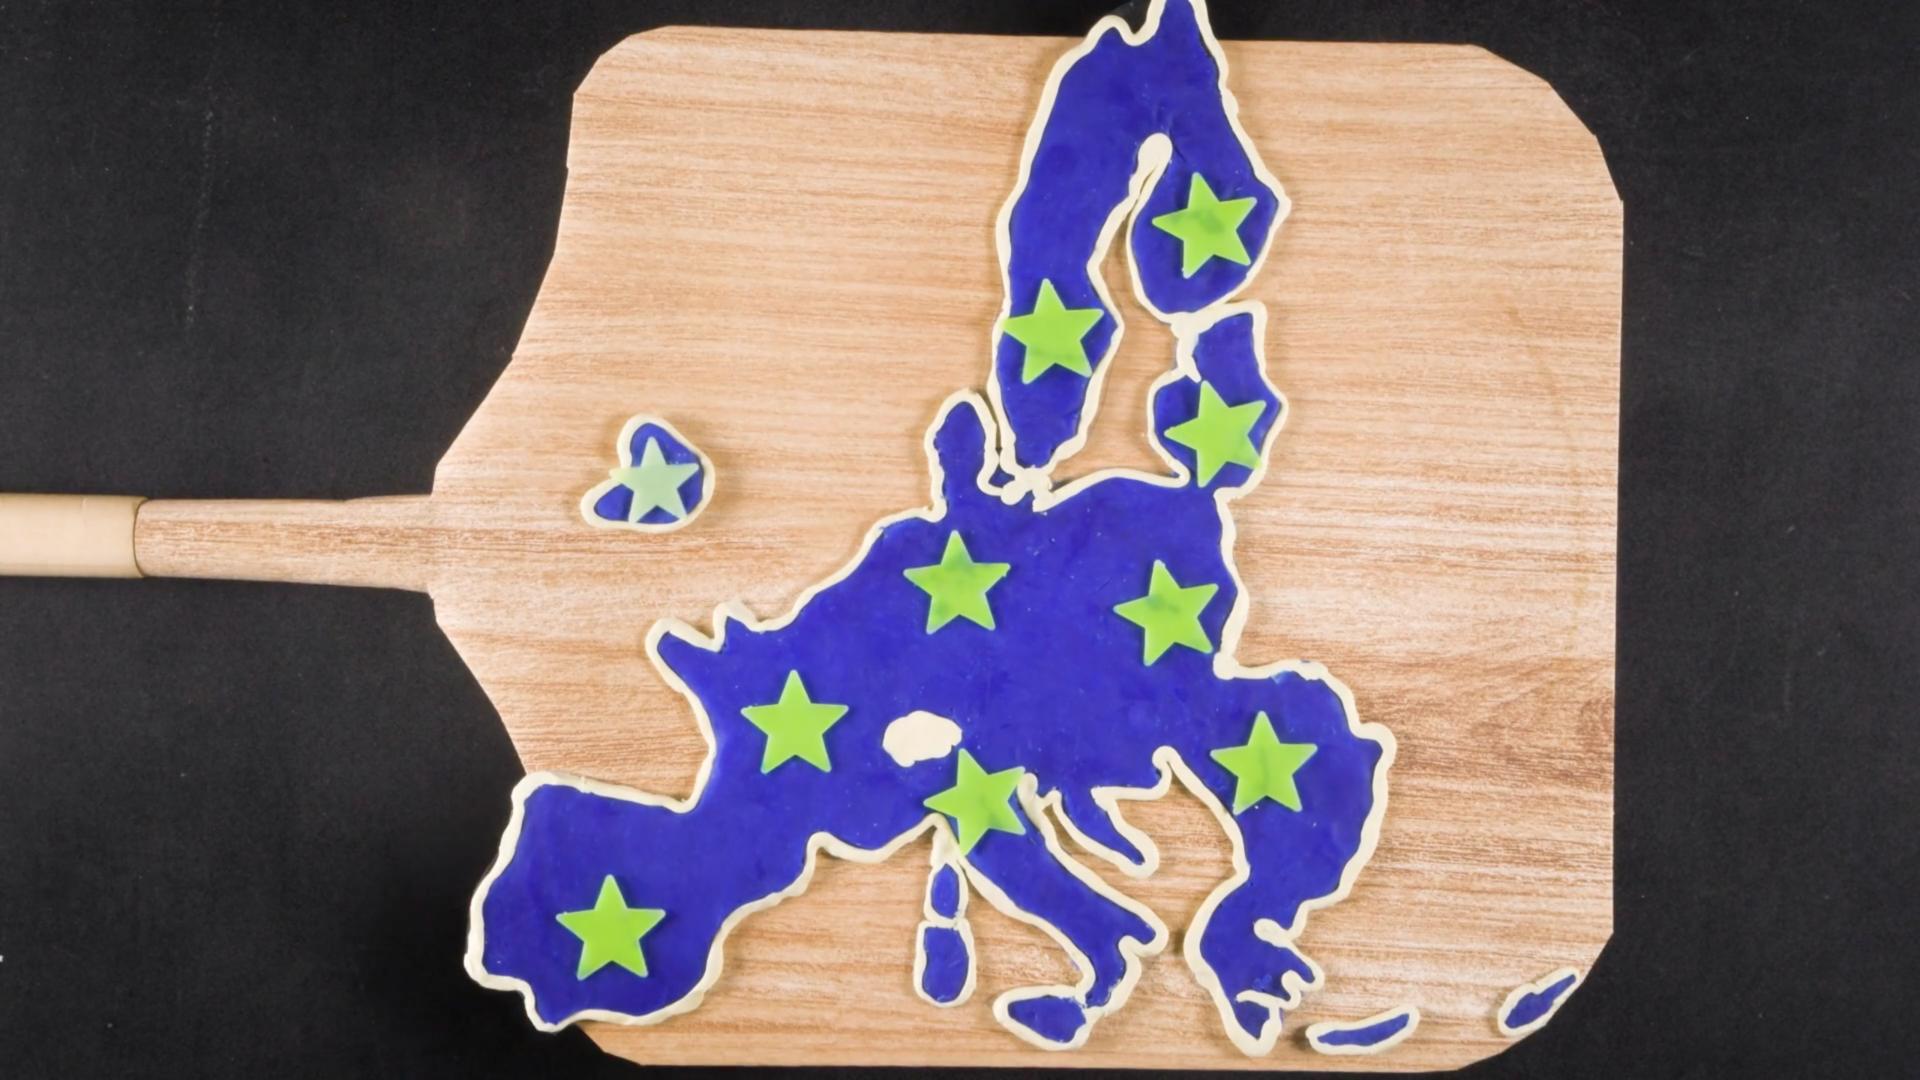 animo-film-shape-of-europe